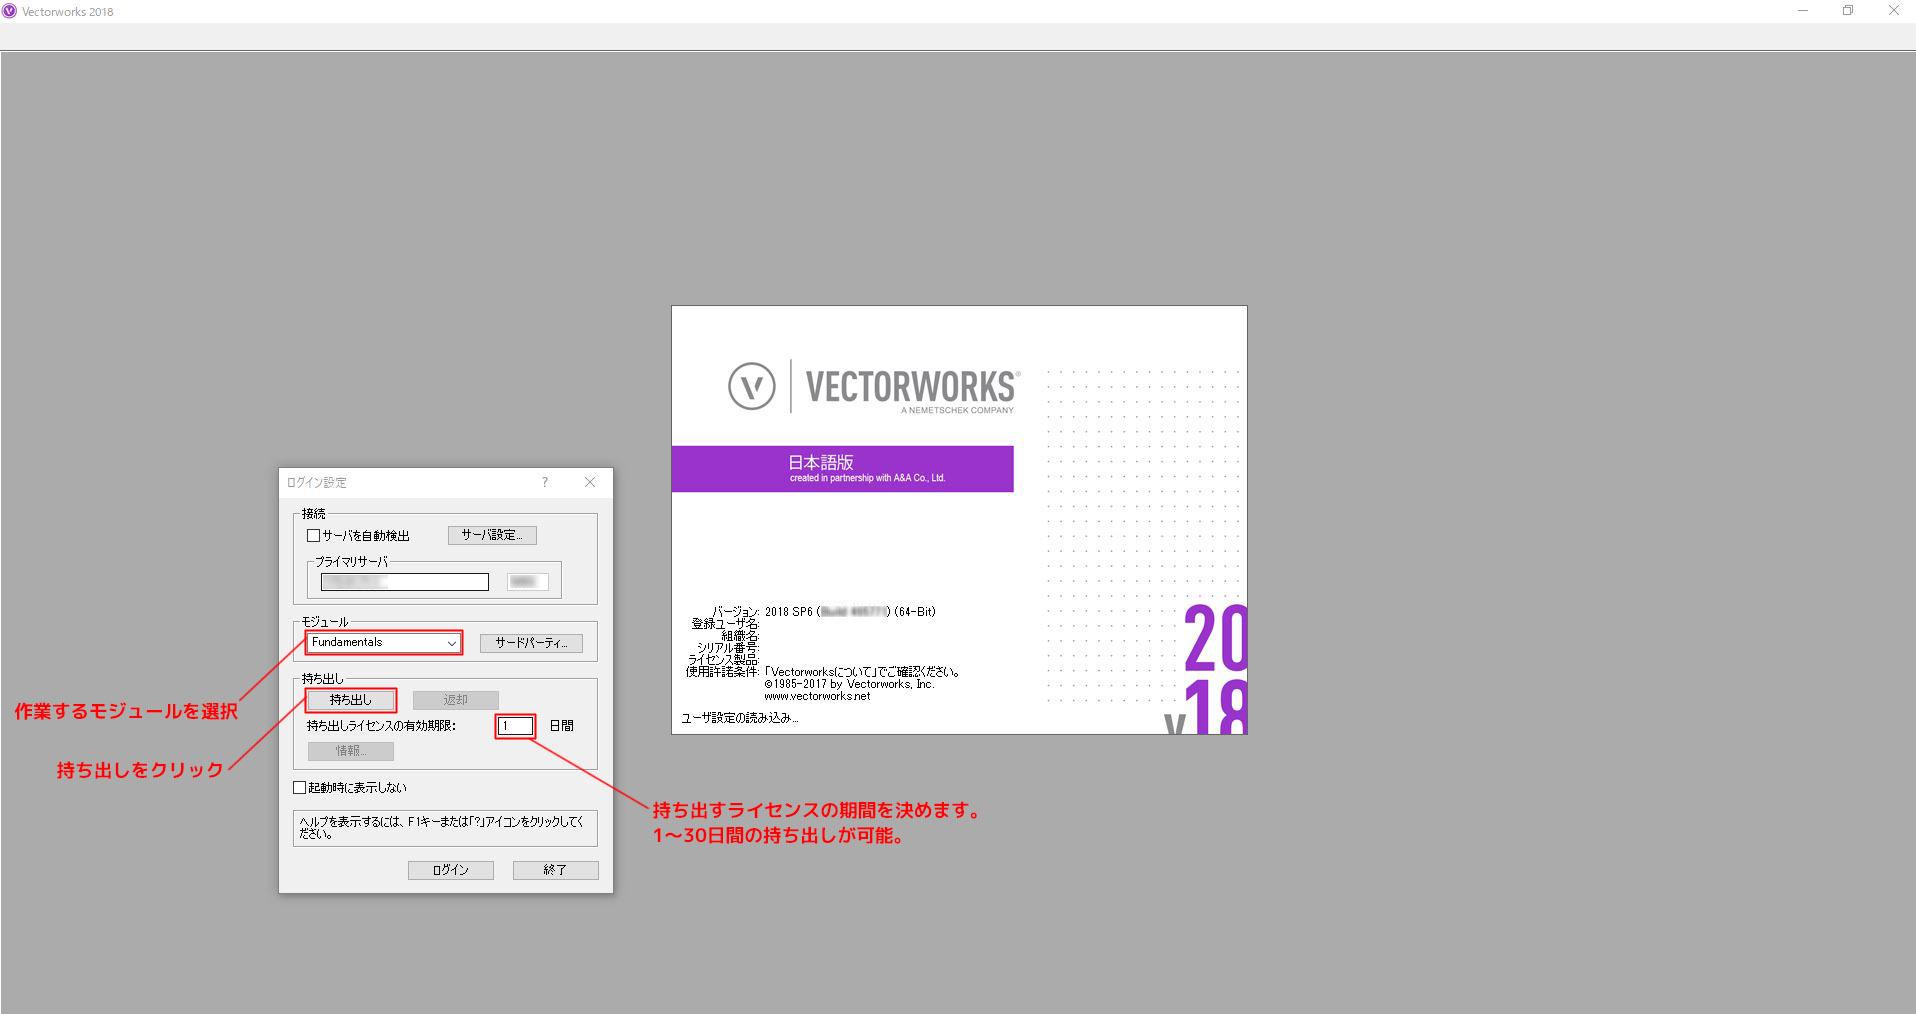 Vectorworksネットワーク版のライセンスを持ち出す方法。テレワーク・外出・出張でも作図ができるようになる。